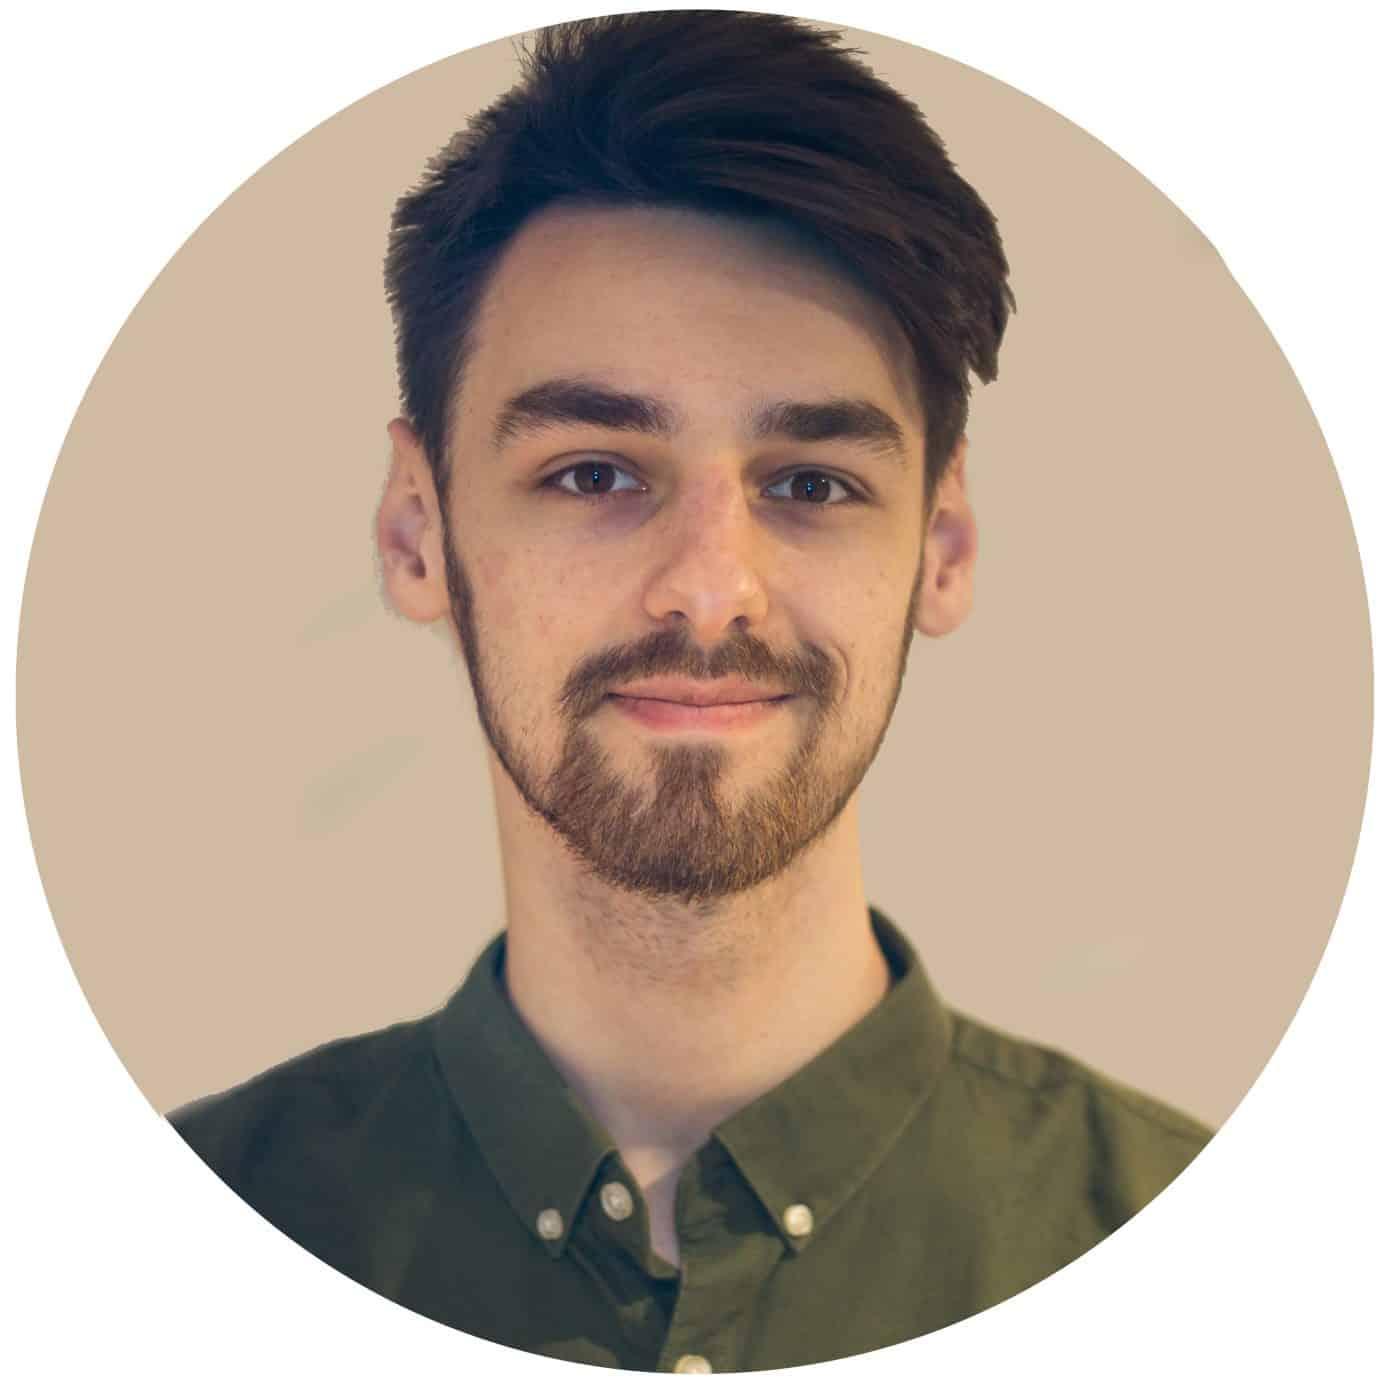 alex jeffries digital marketer at How2Become